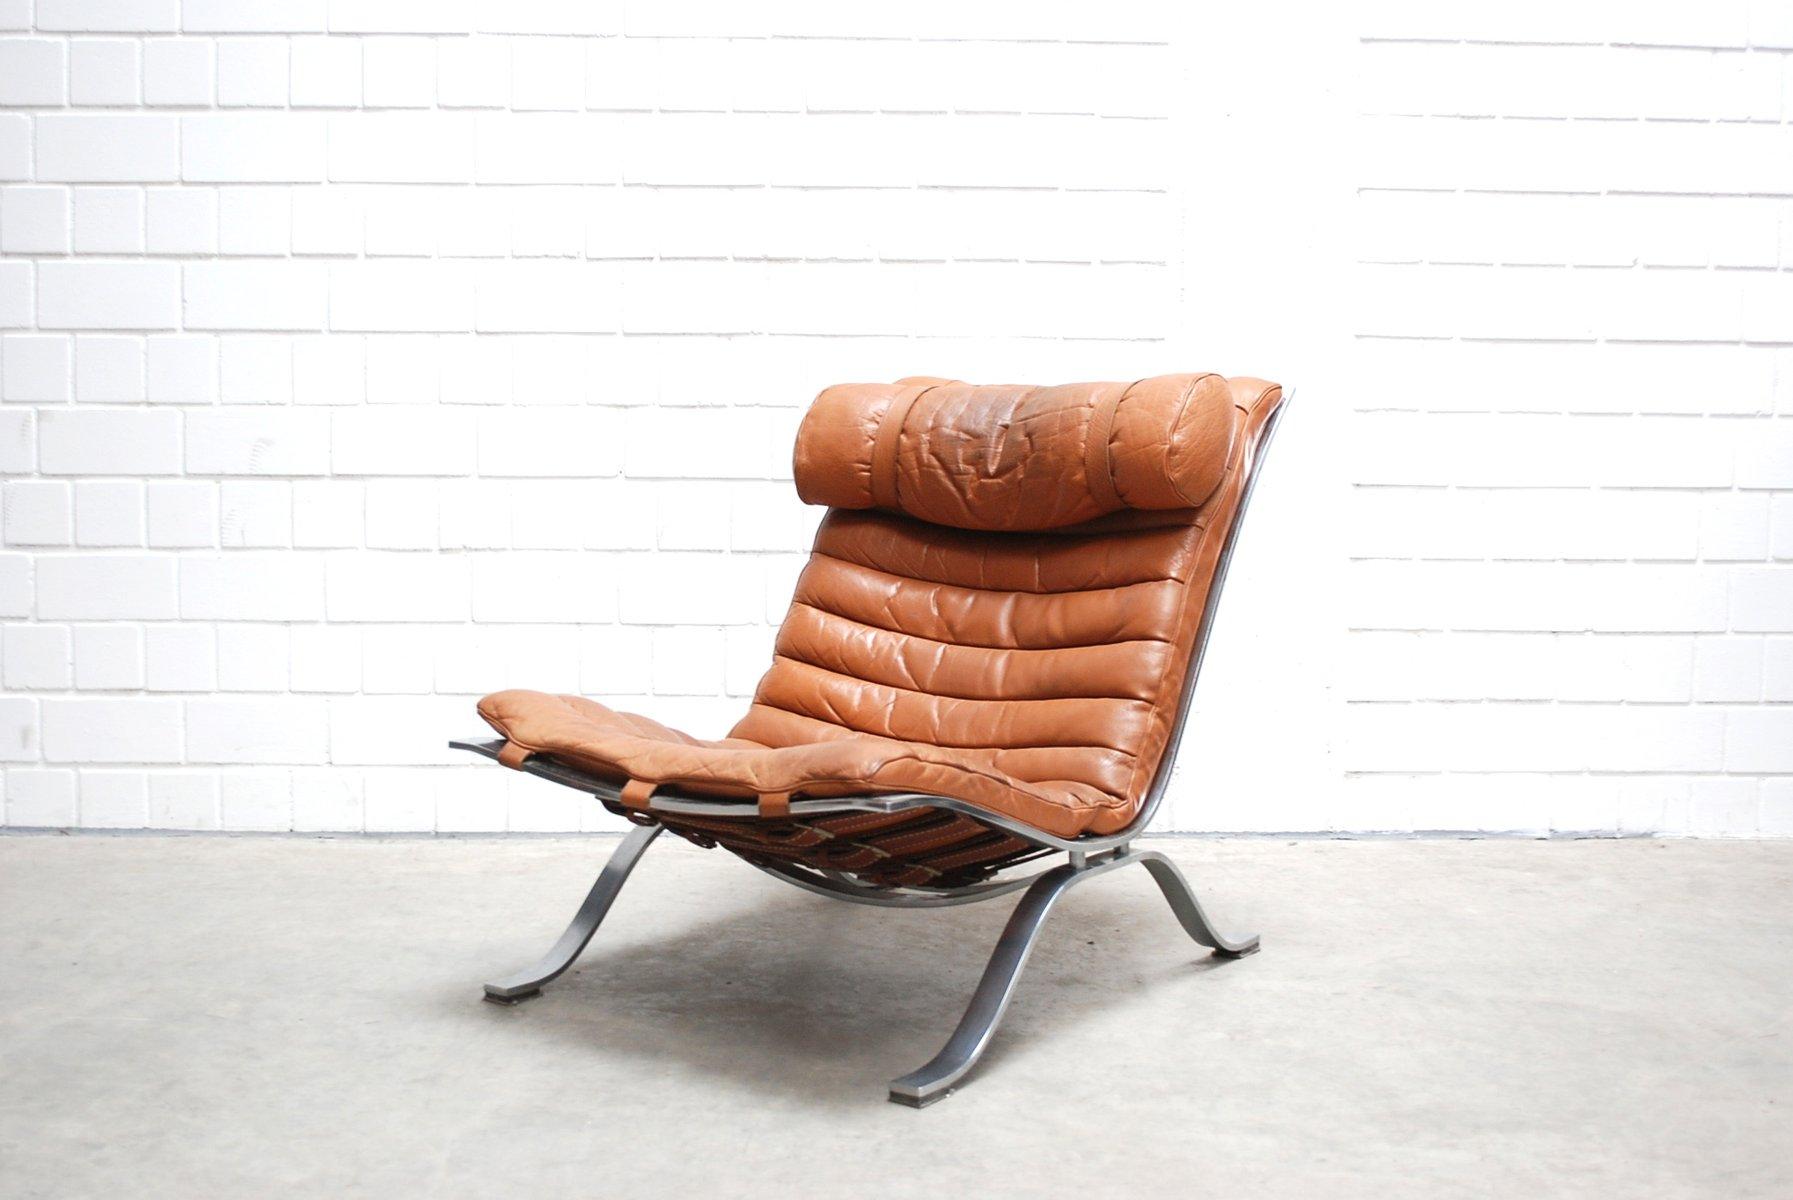 Vintage Ari Lounge Chair In Cognac Brandy Leather By Arne